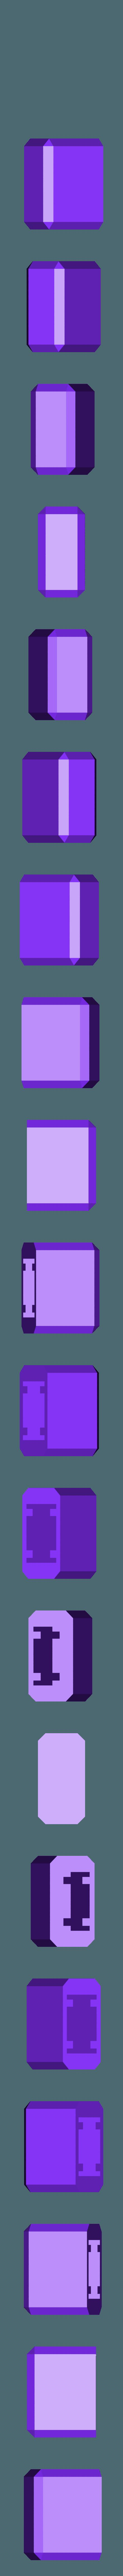 Tapón USB.stl Download free STL file Otg flash drive case • 3D print template, Loren